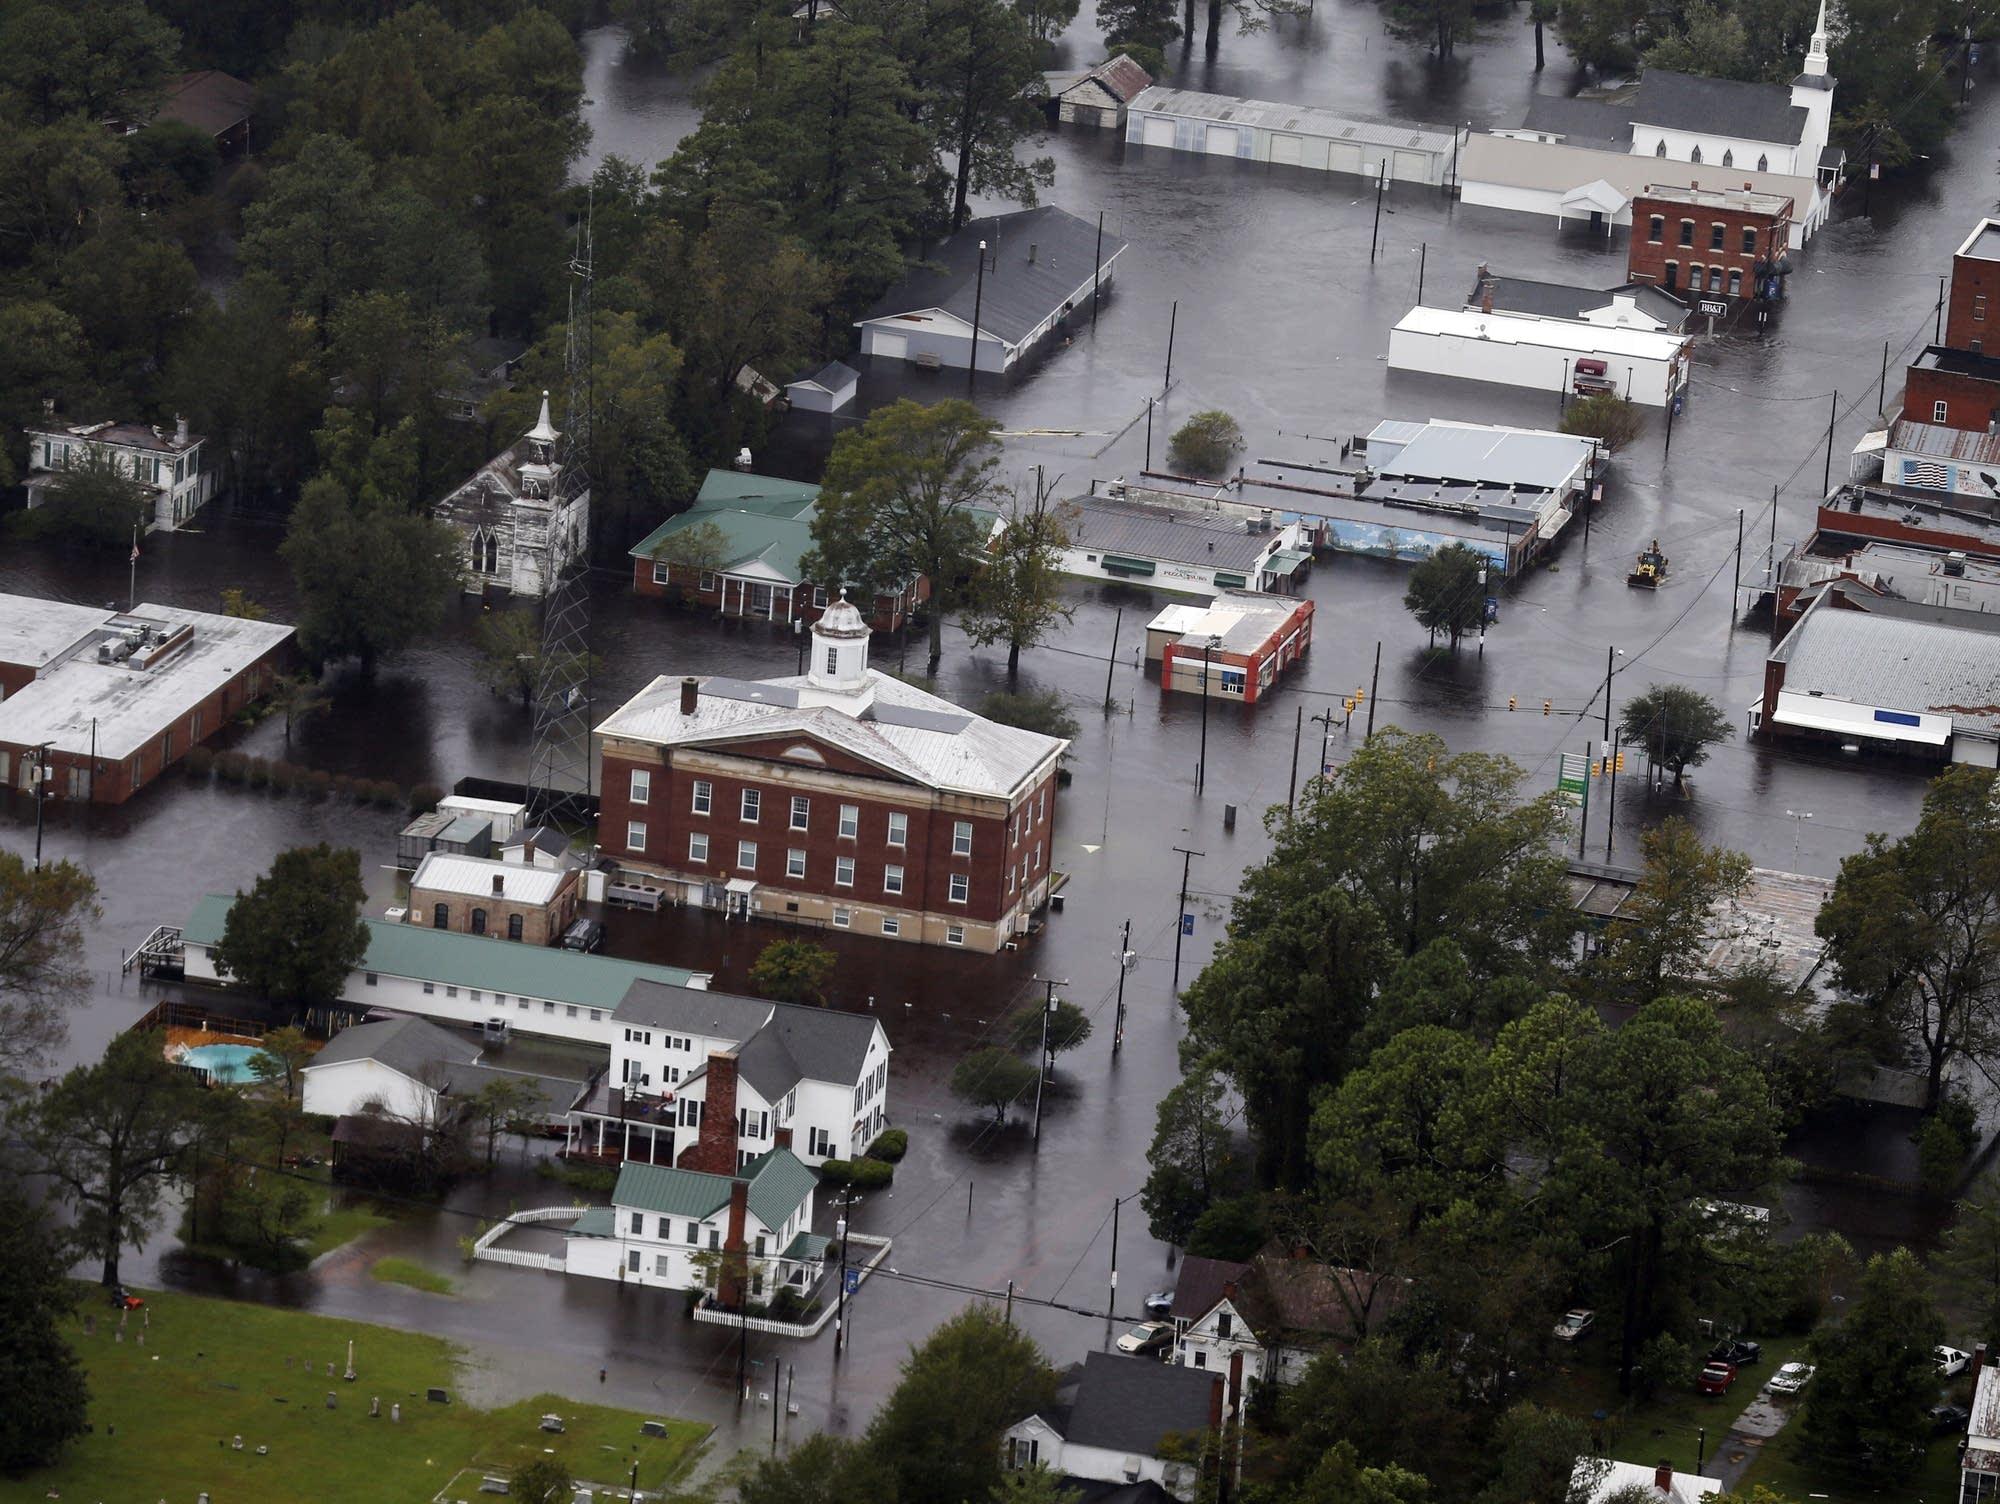 Photos Rising Rivers Evacuations In Carolinas In Wake Of